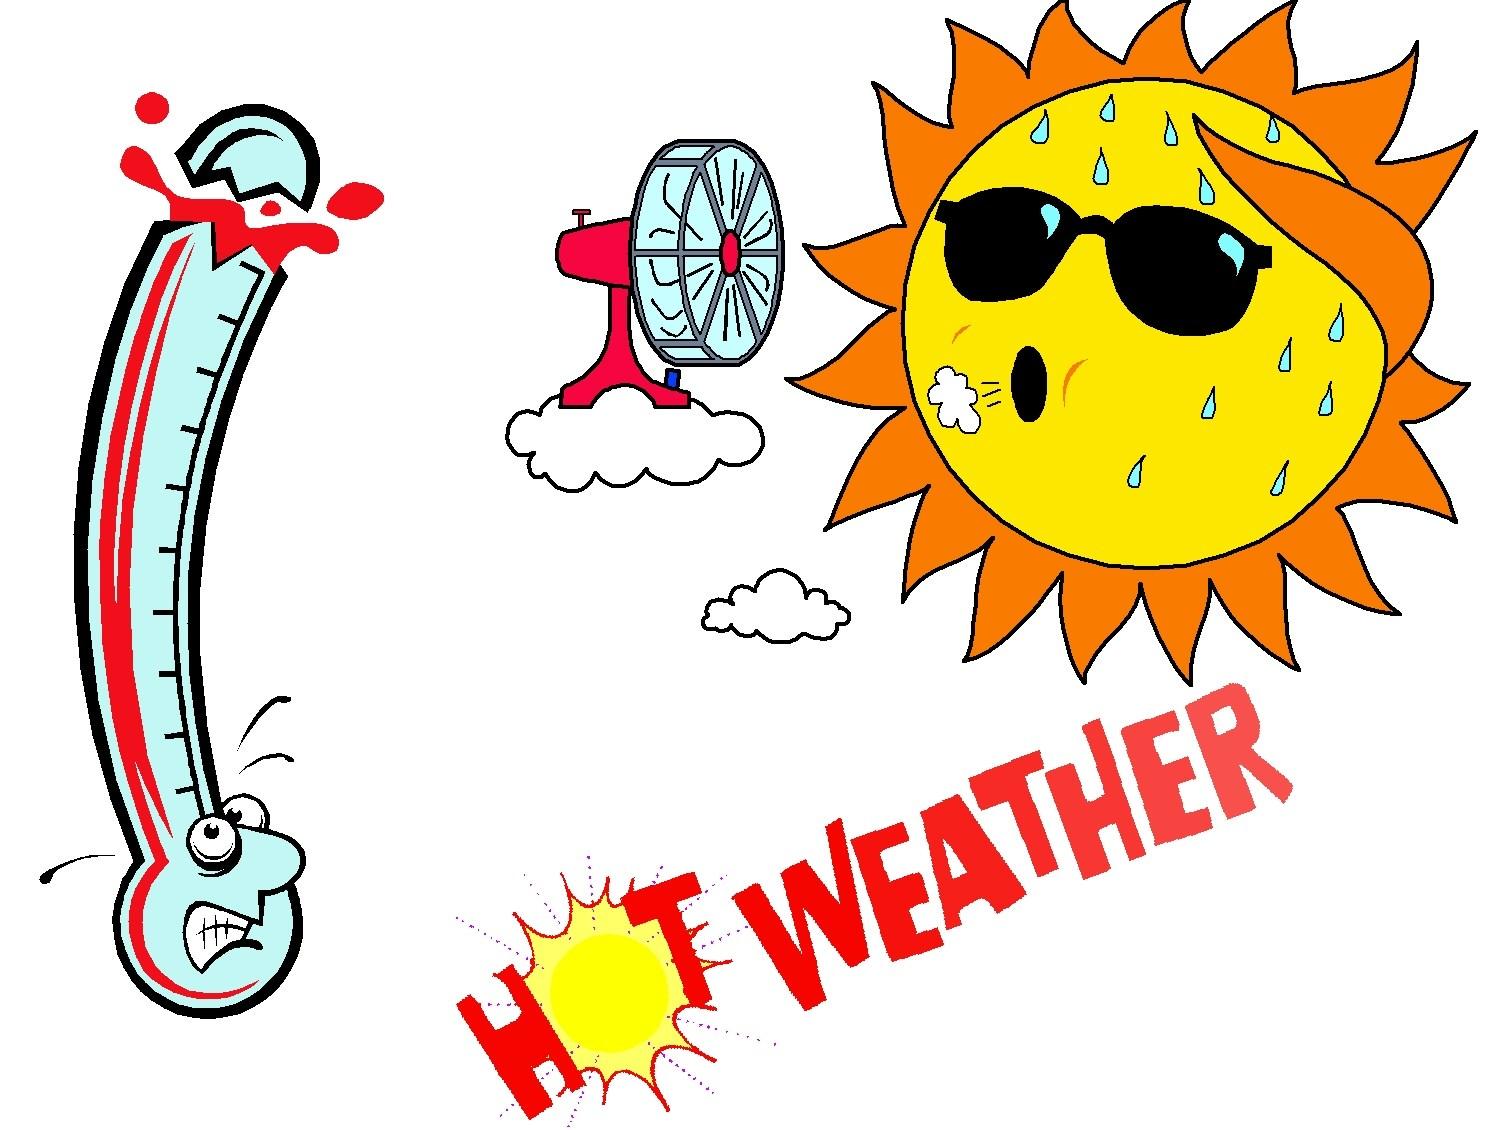 Warm day clipart jpg free stock Warm day clipart 7 » Clipart Portal jpg free stock